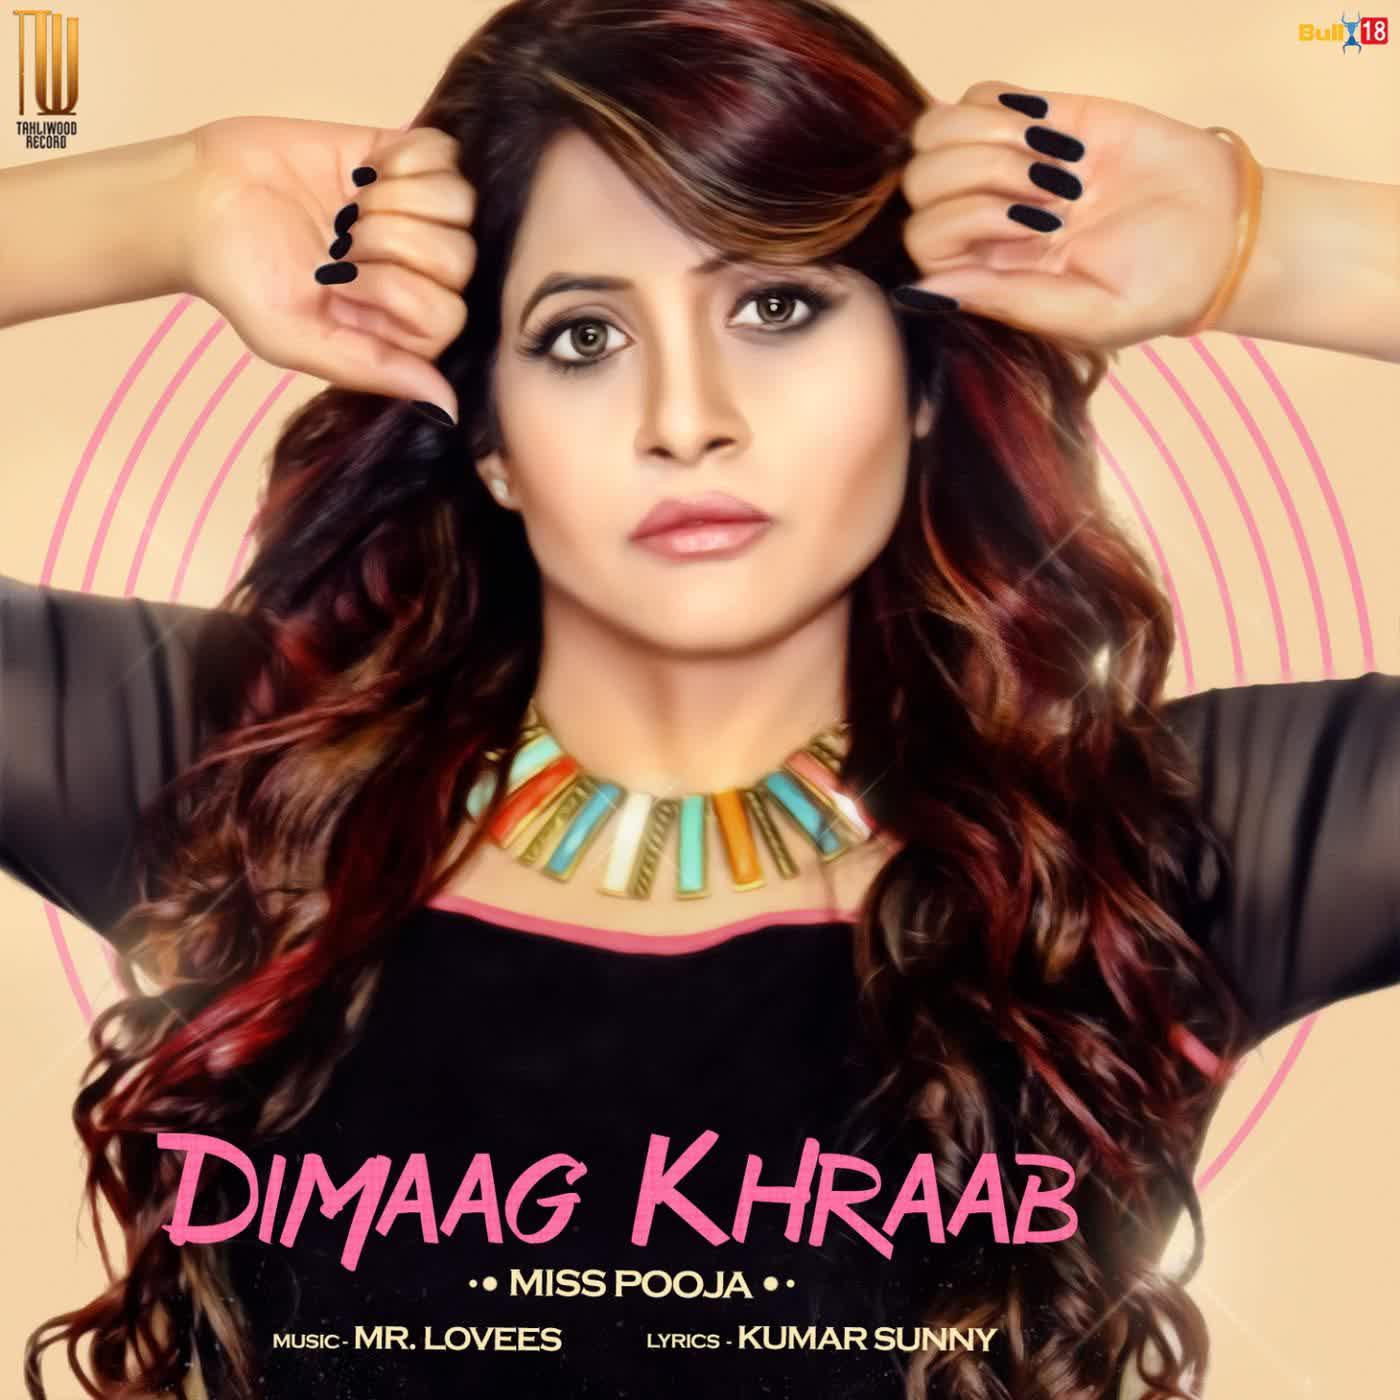 Dimaag Khraab Miss Pooja